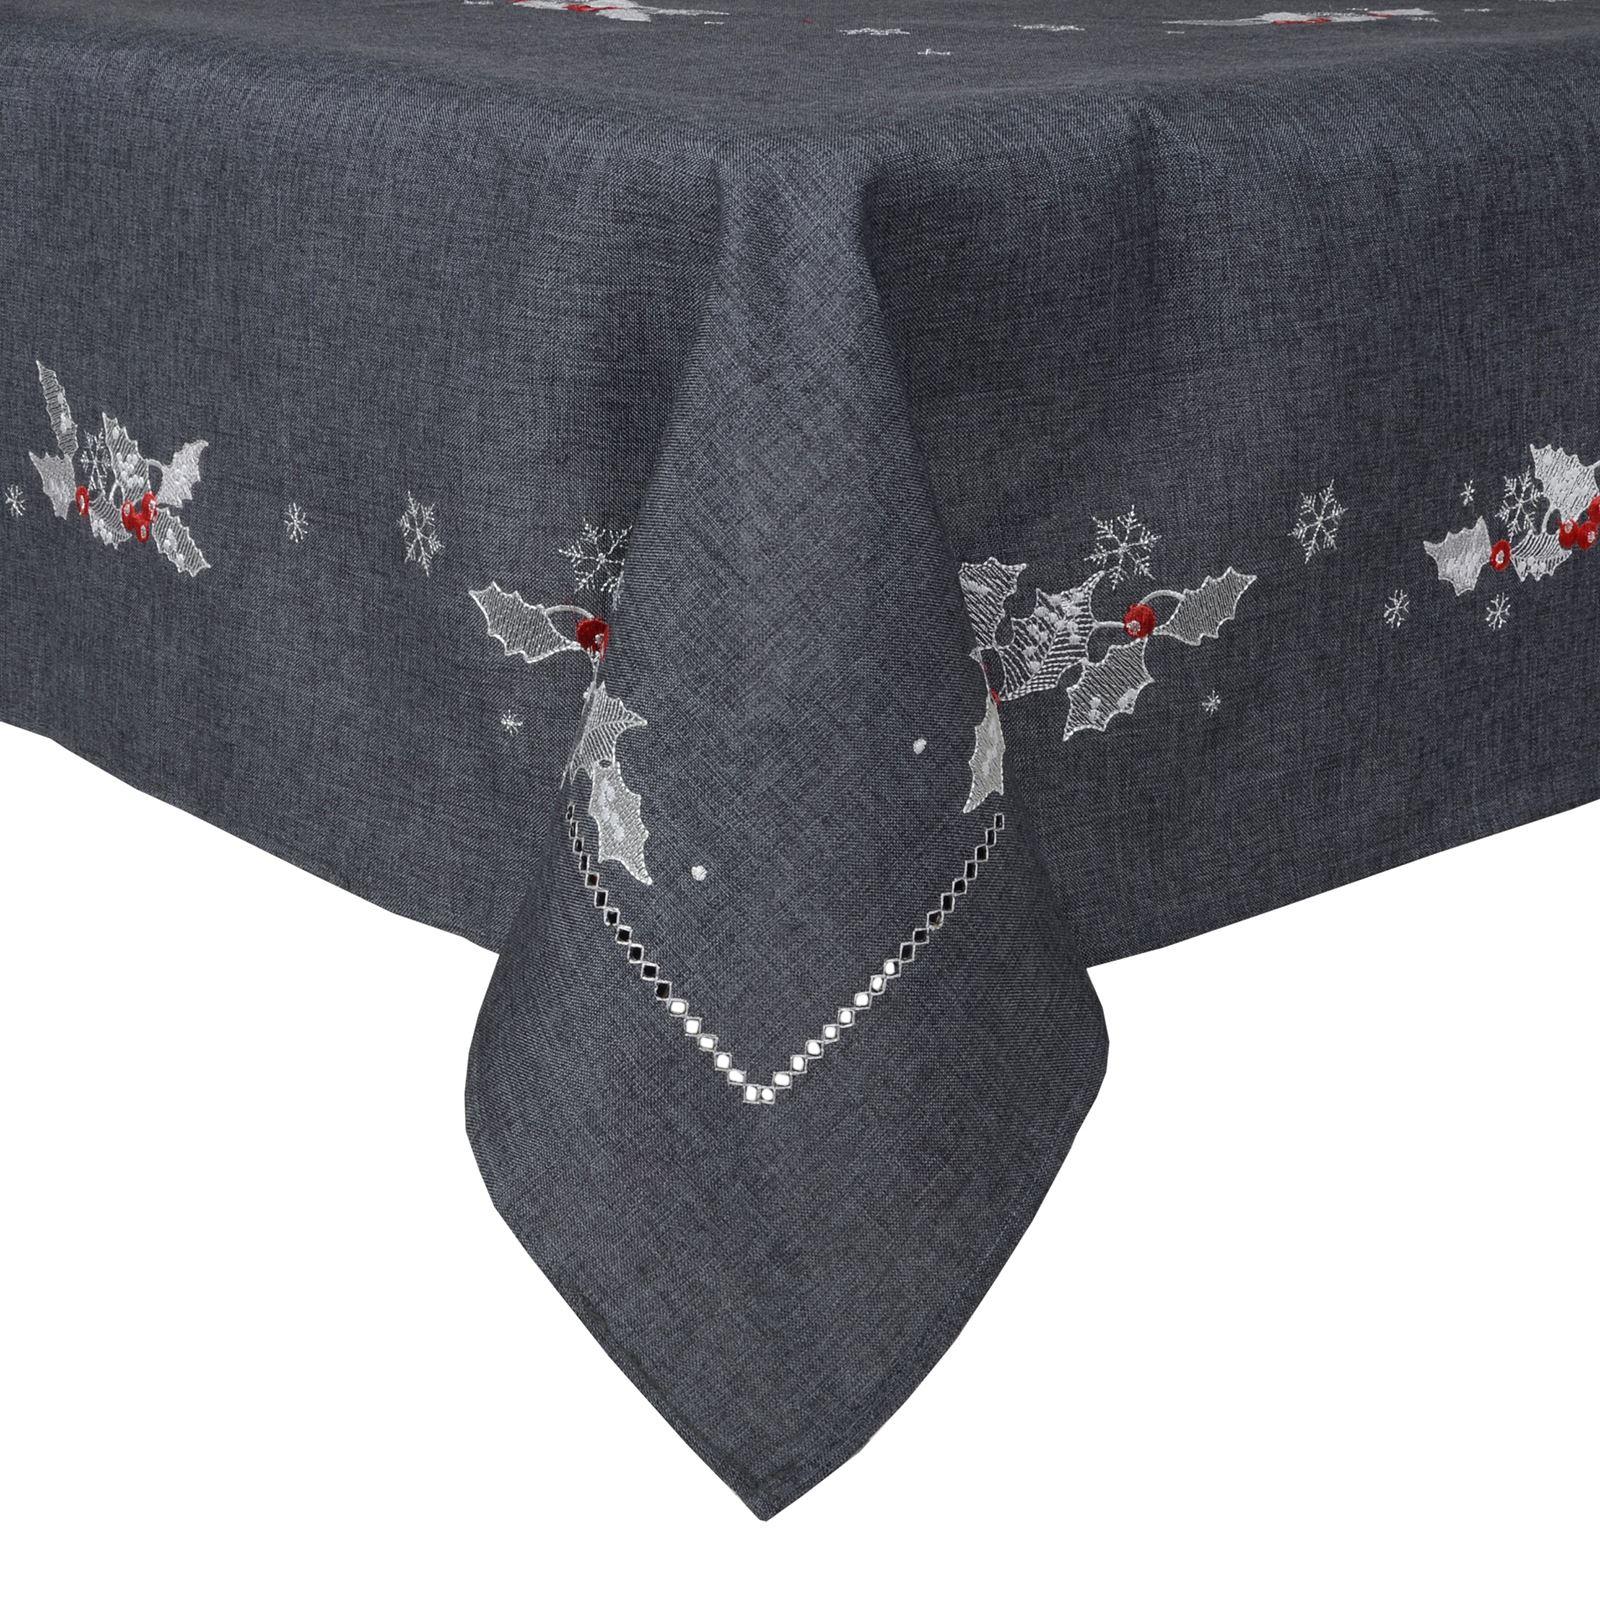 Christmas-Tablecloth-Festive-Pattern-Rectangle-Round-Fabric-Xmas-Room-Decoration Indexbild 93